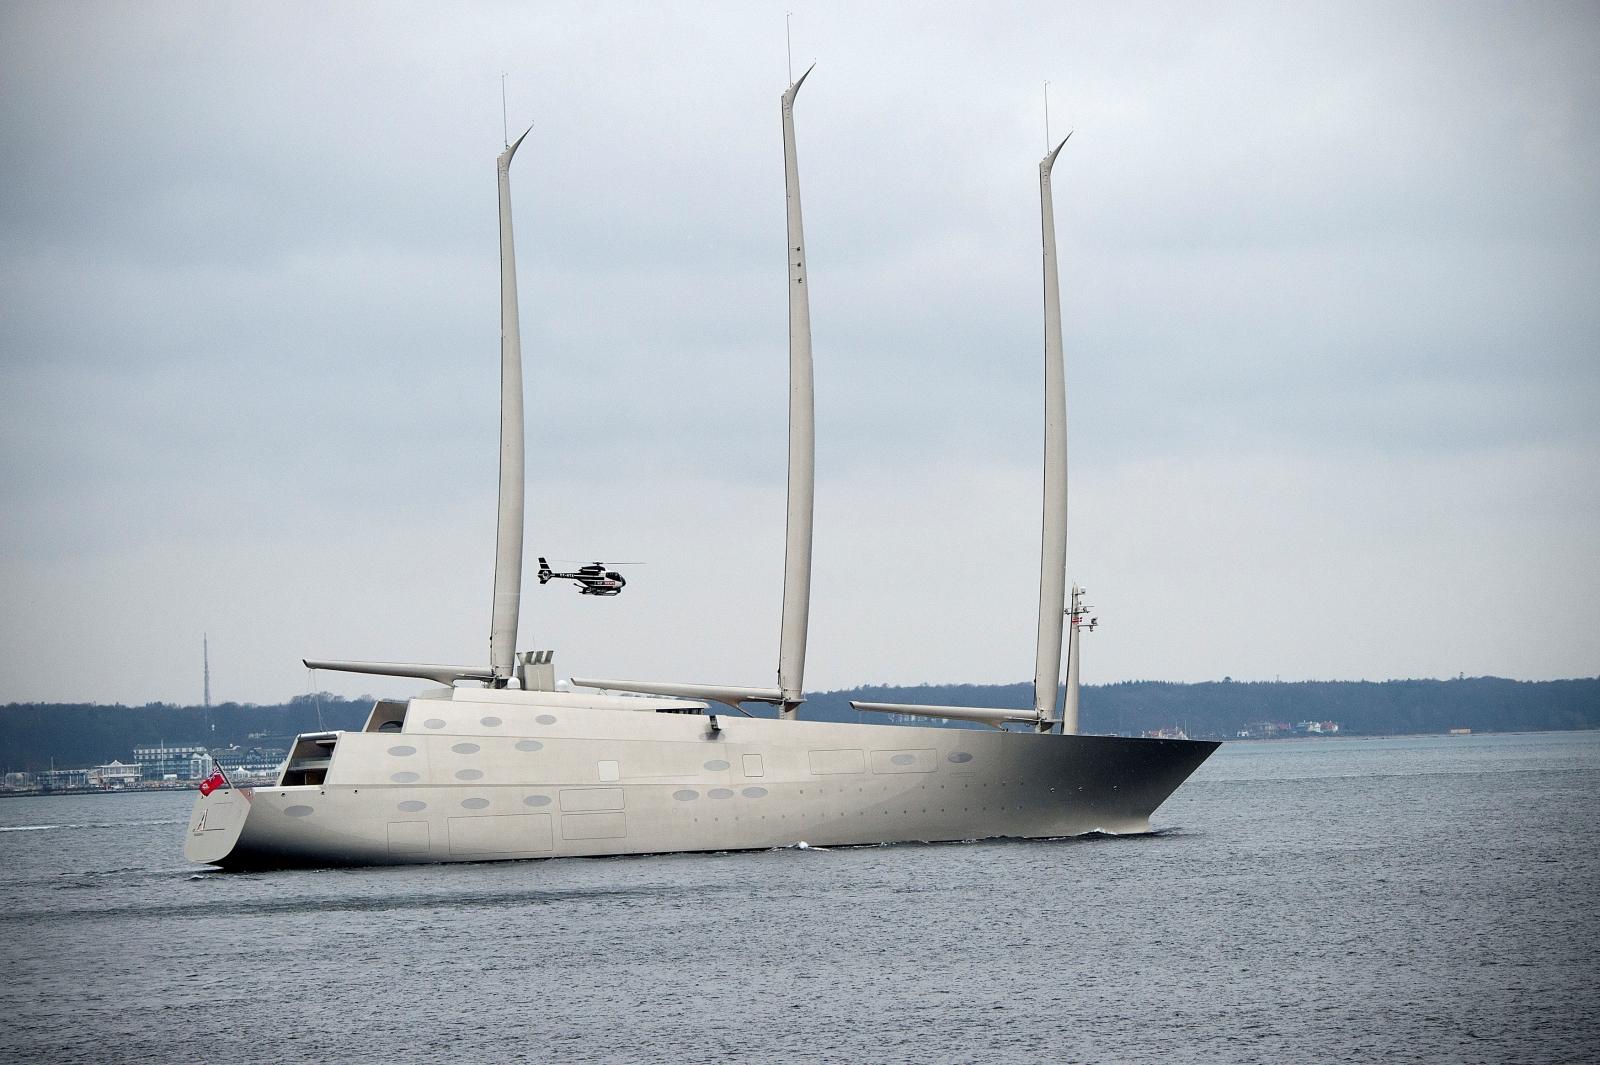 Russian Billionaires Futuristic 425m Superyacht Seized